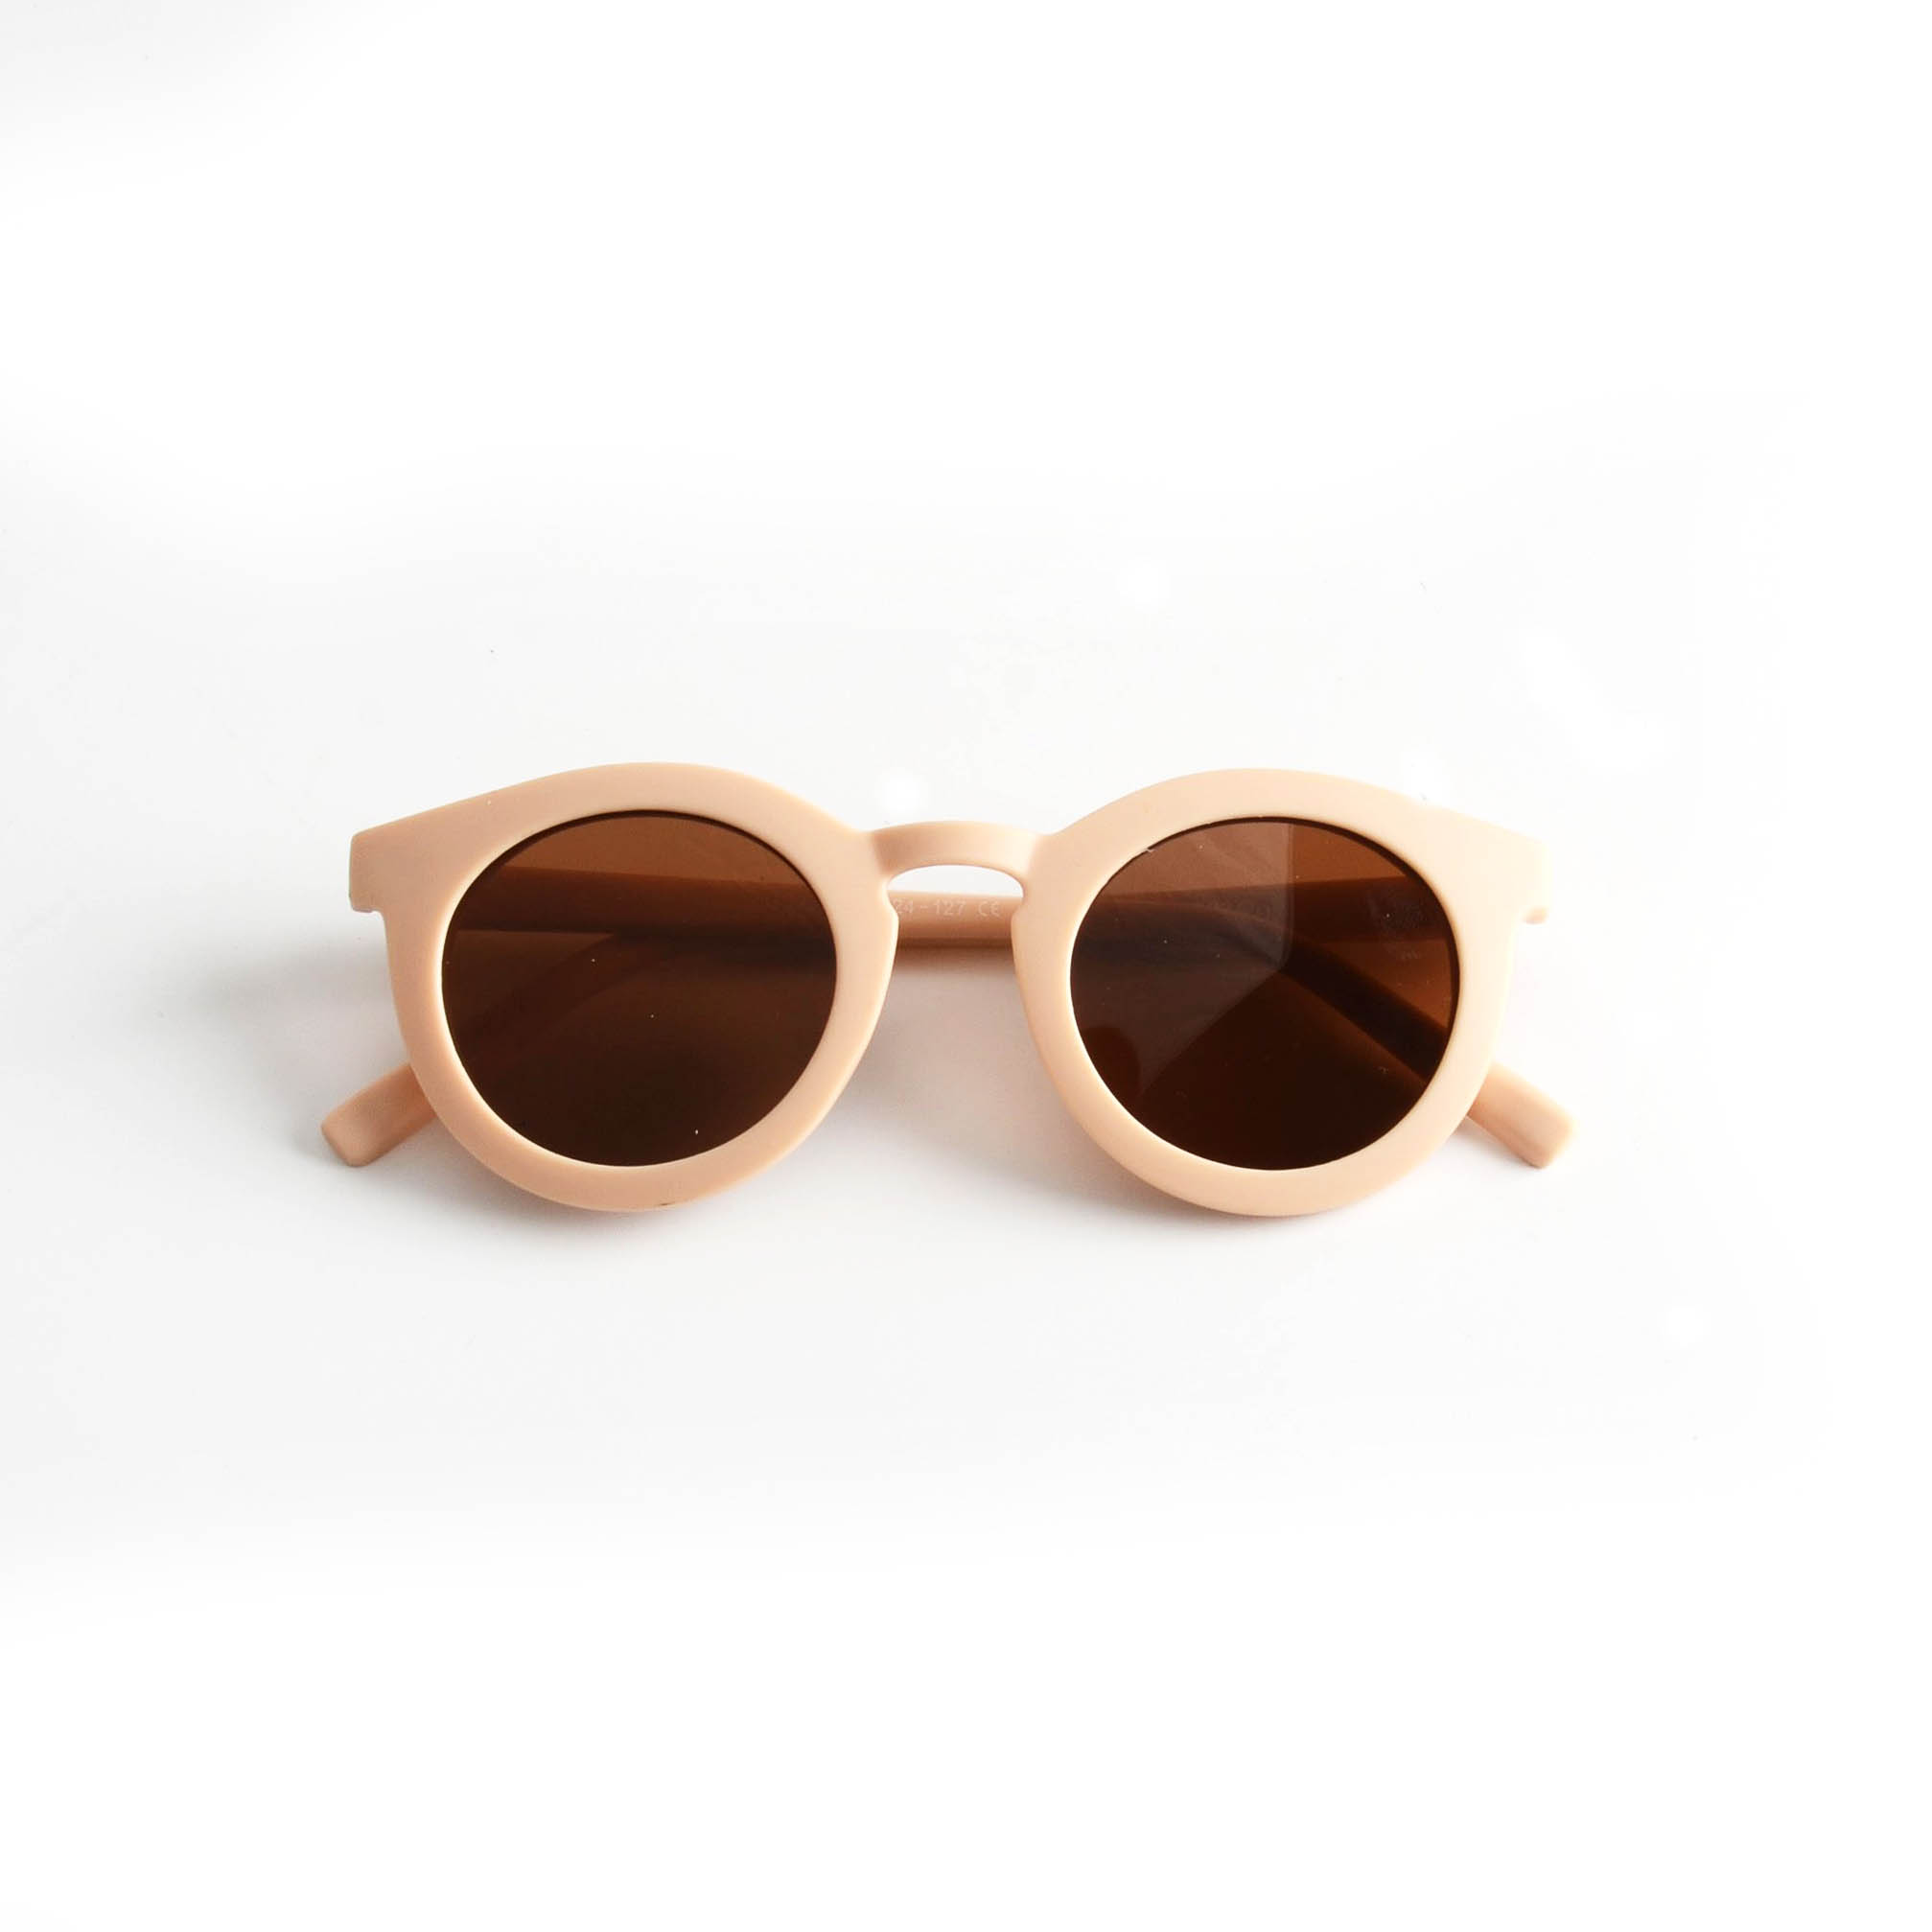 Adult Recycled Plastic Sunglasses Shell 14.5cm x 15cm